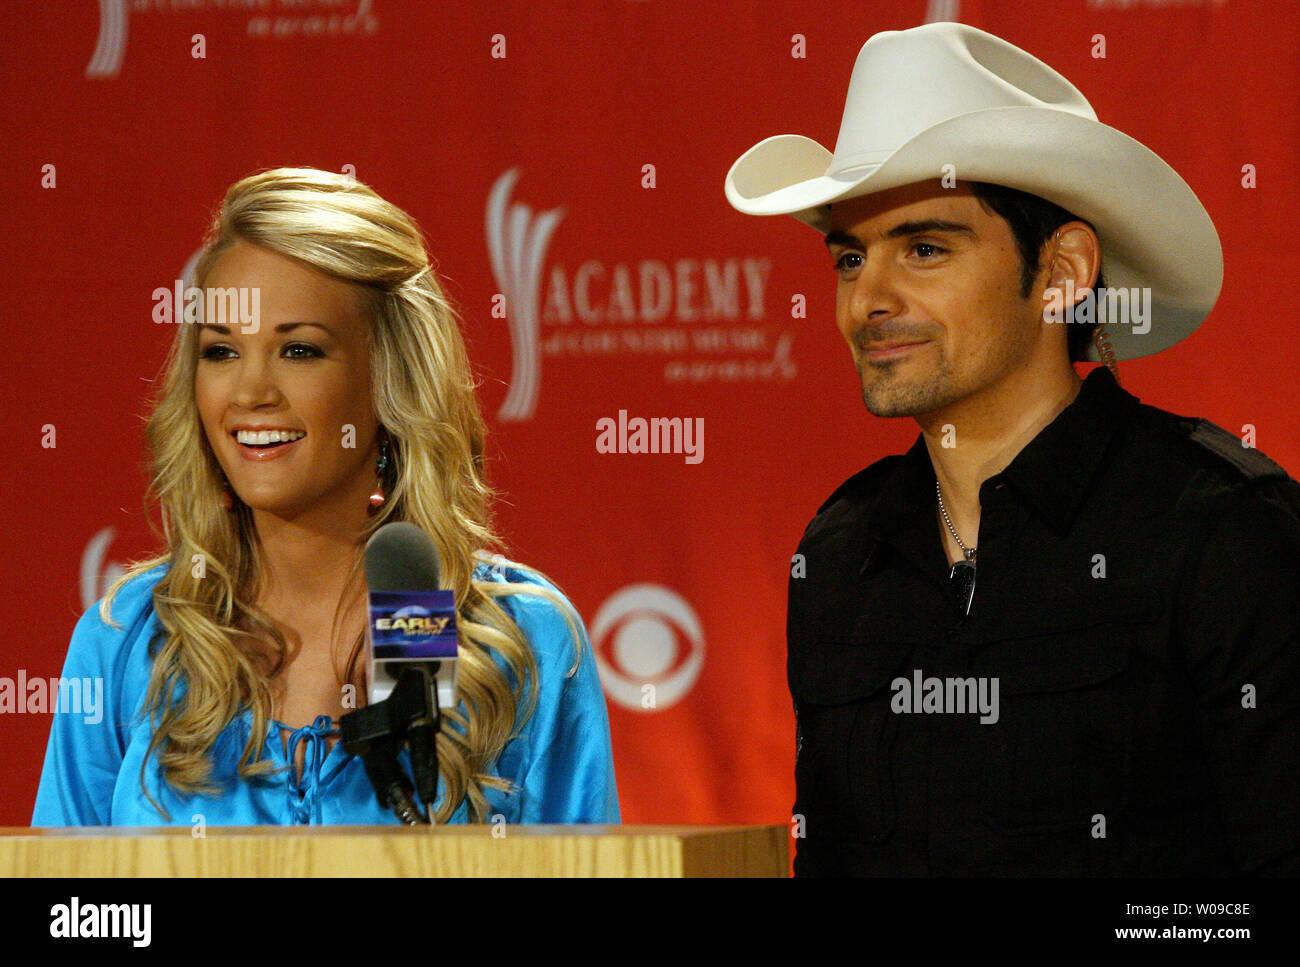 Wie was Carrie Underwood dating in 2008